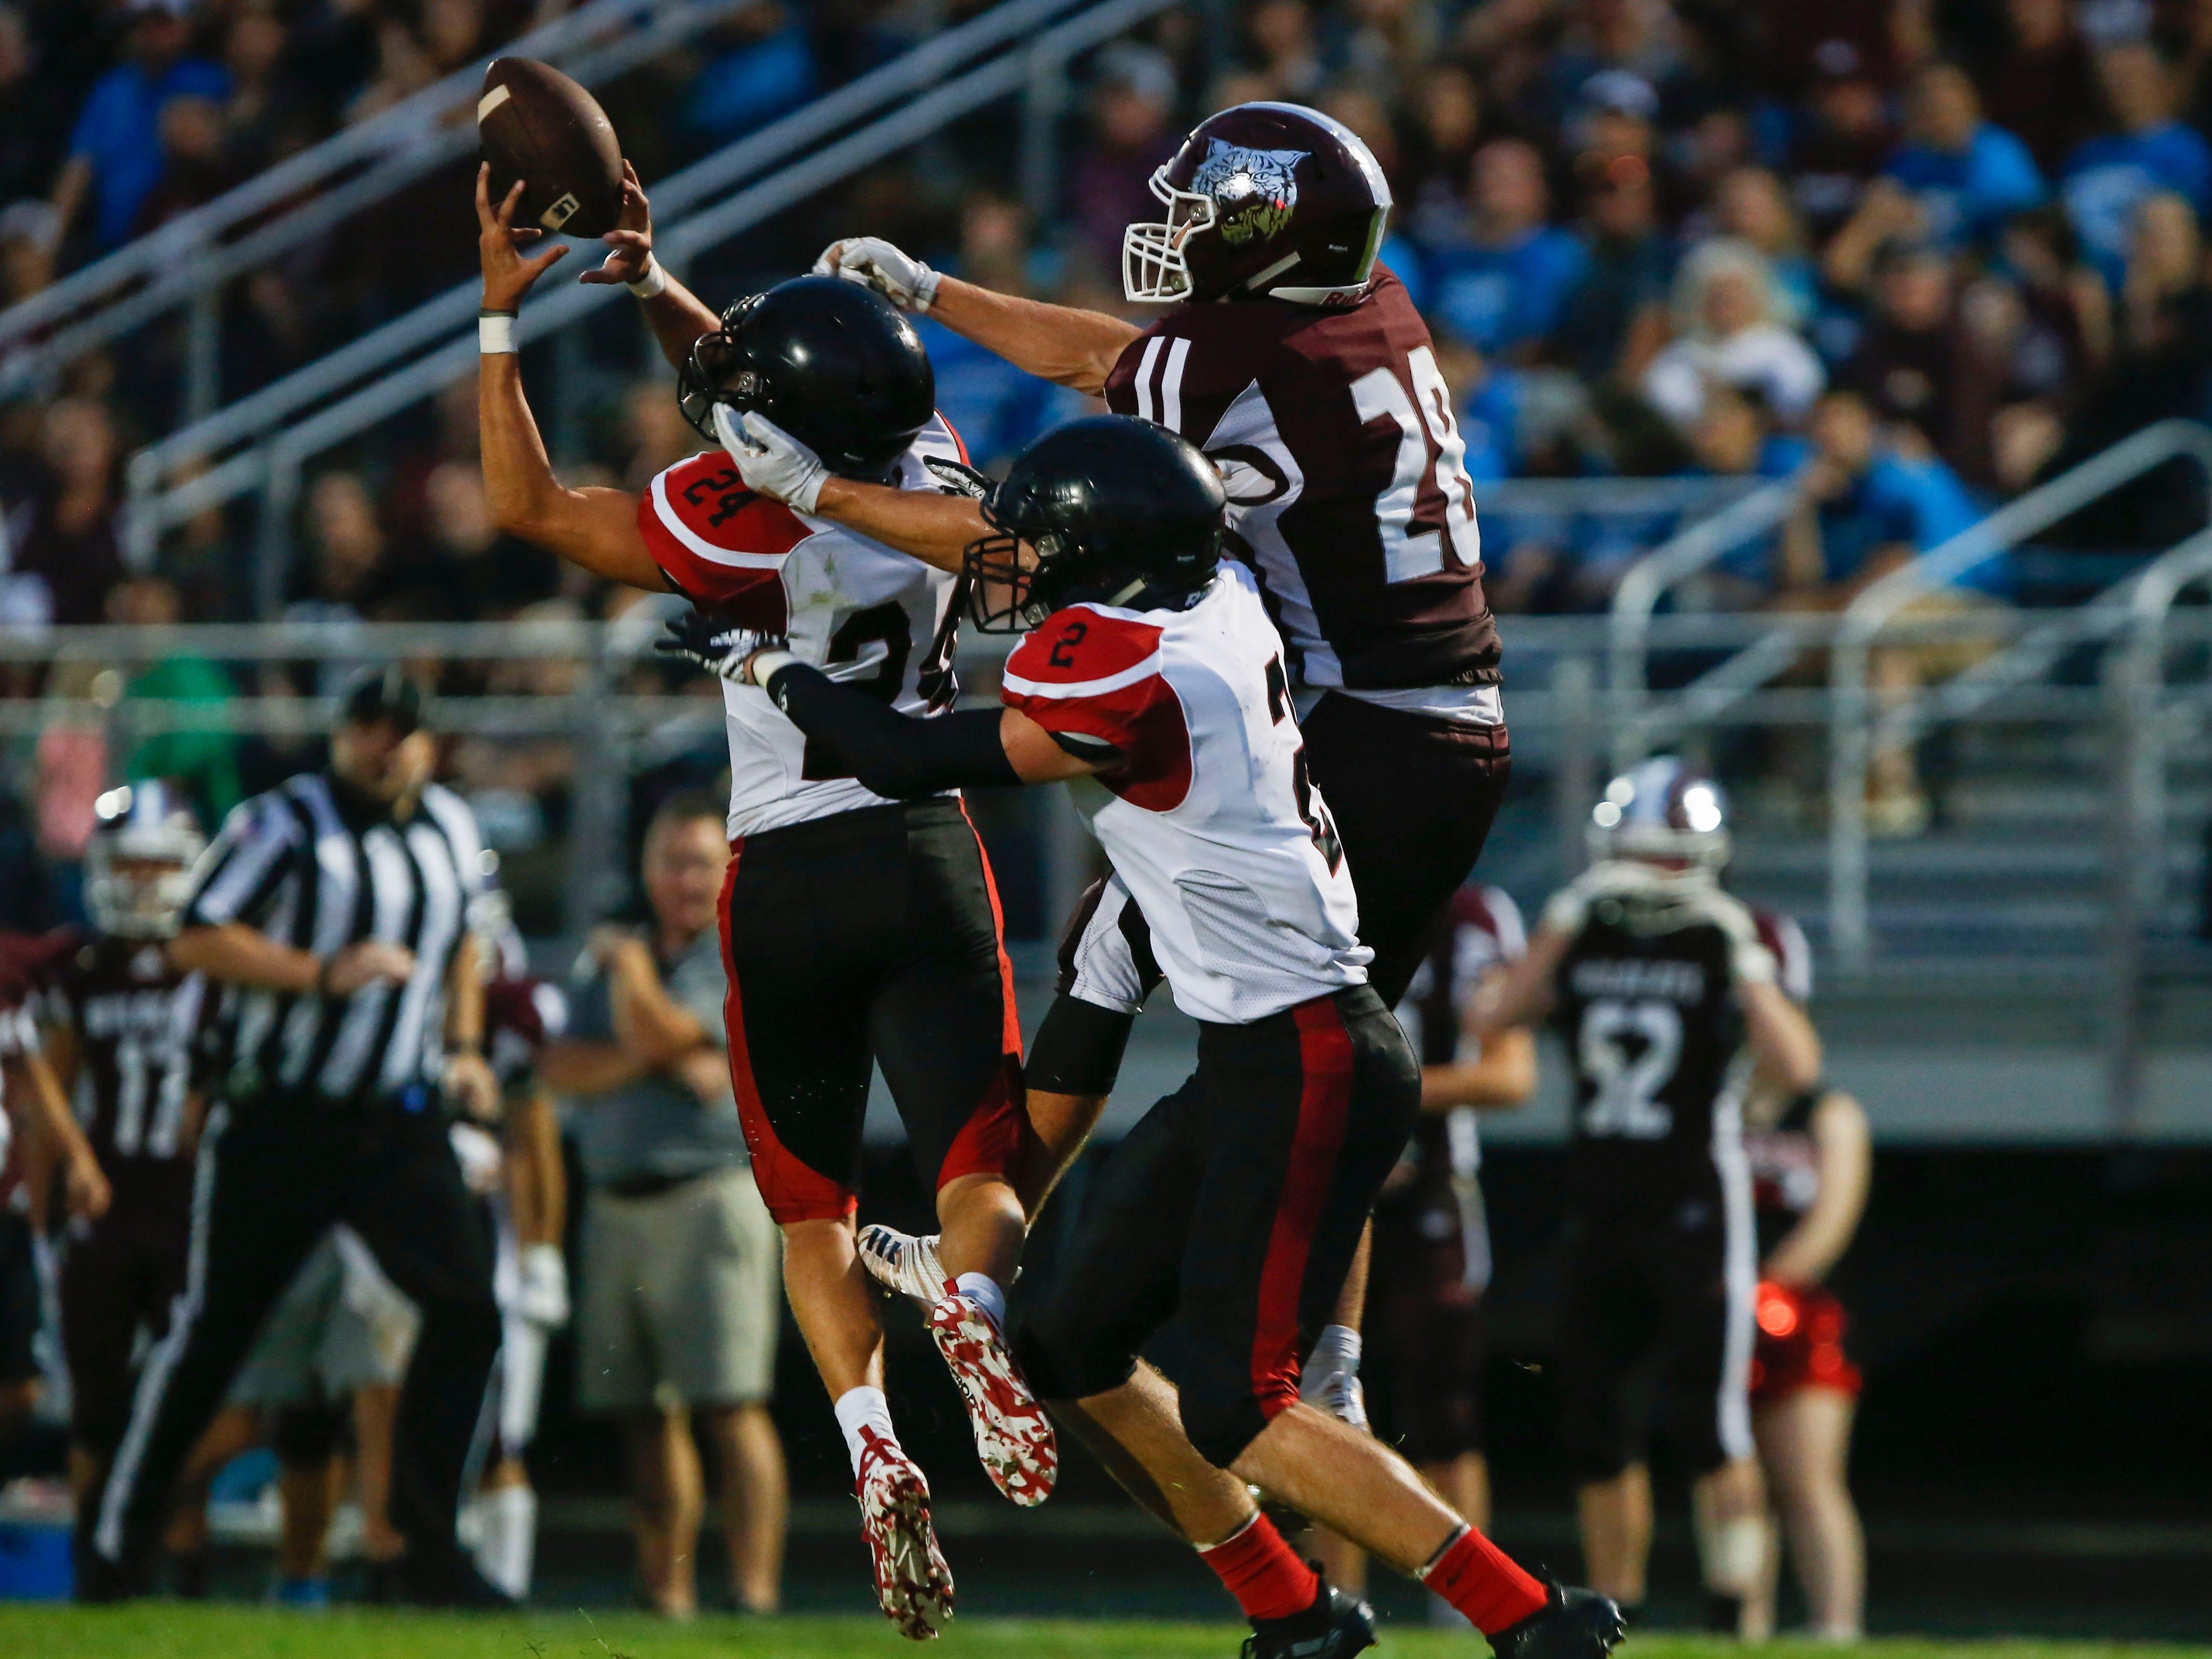 Lamar High School senior Landon Hardman makes an interception while Logan-Rogersville senior Ryker Strong attempts to break up the play during a game on Friday, Aug. 24, 2018.